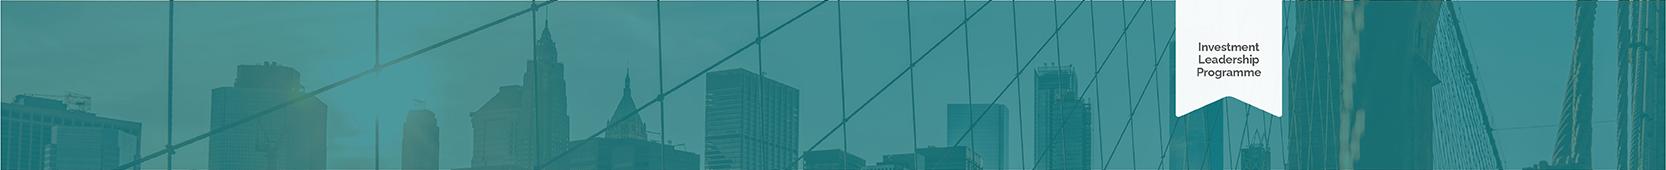 UN-convened Net-Zero Asset Owner Alliance